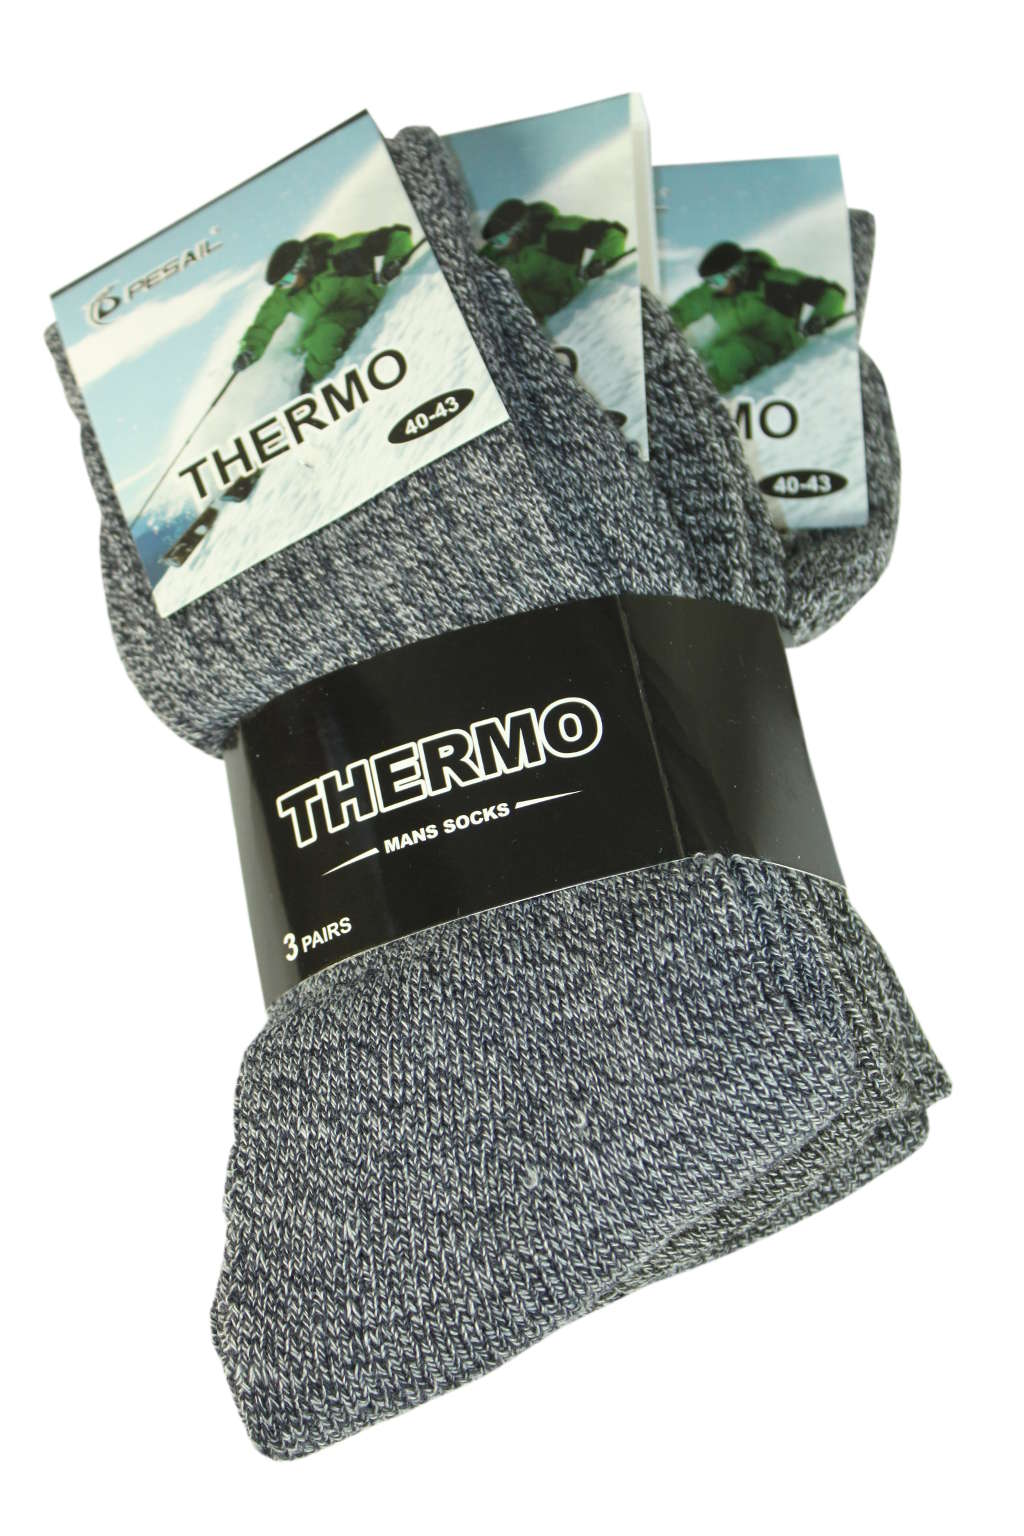 Pánské thermo ponožky - 3pack 40-43 šedá